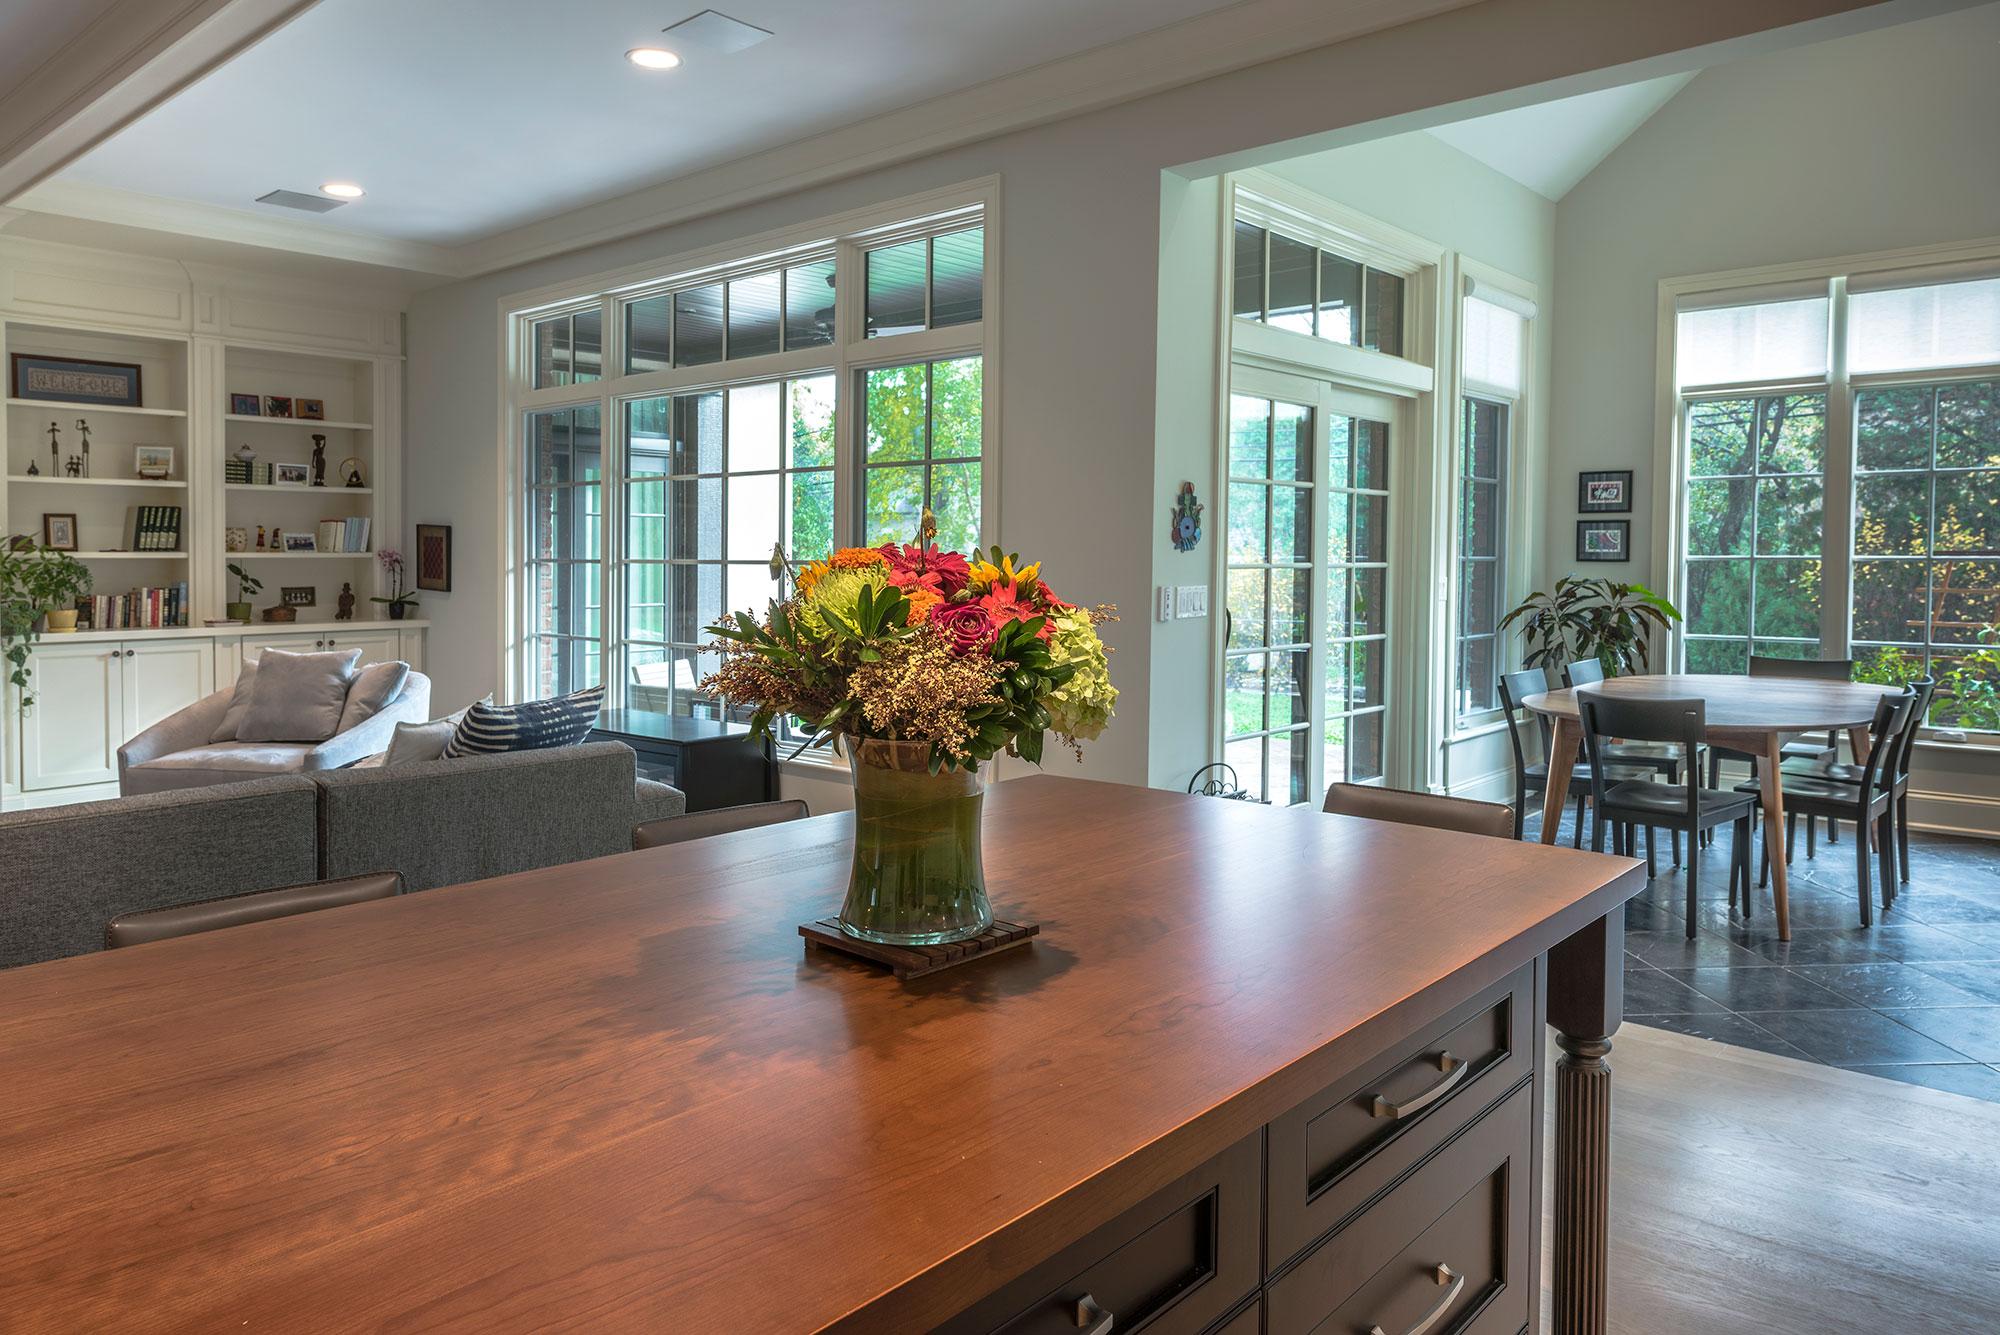 1233 Heather Custom Home Photo Gallery Breakfast Table Windows View